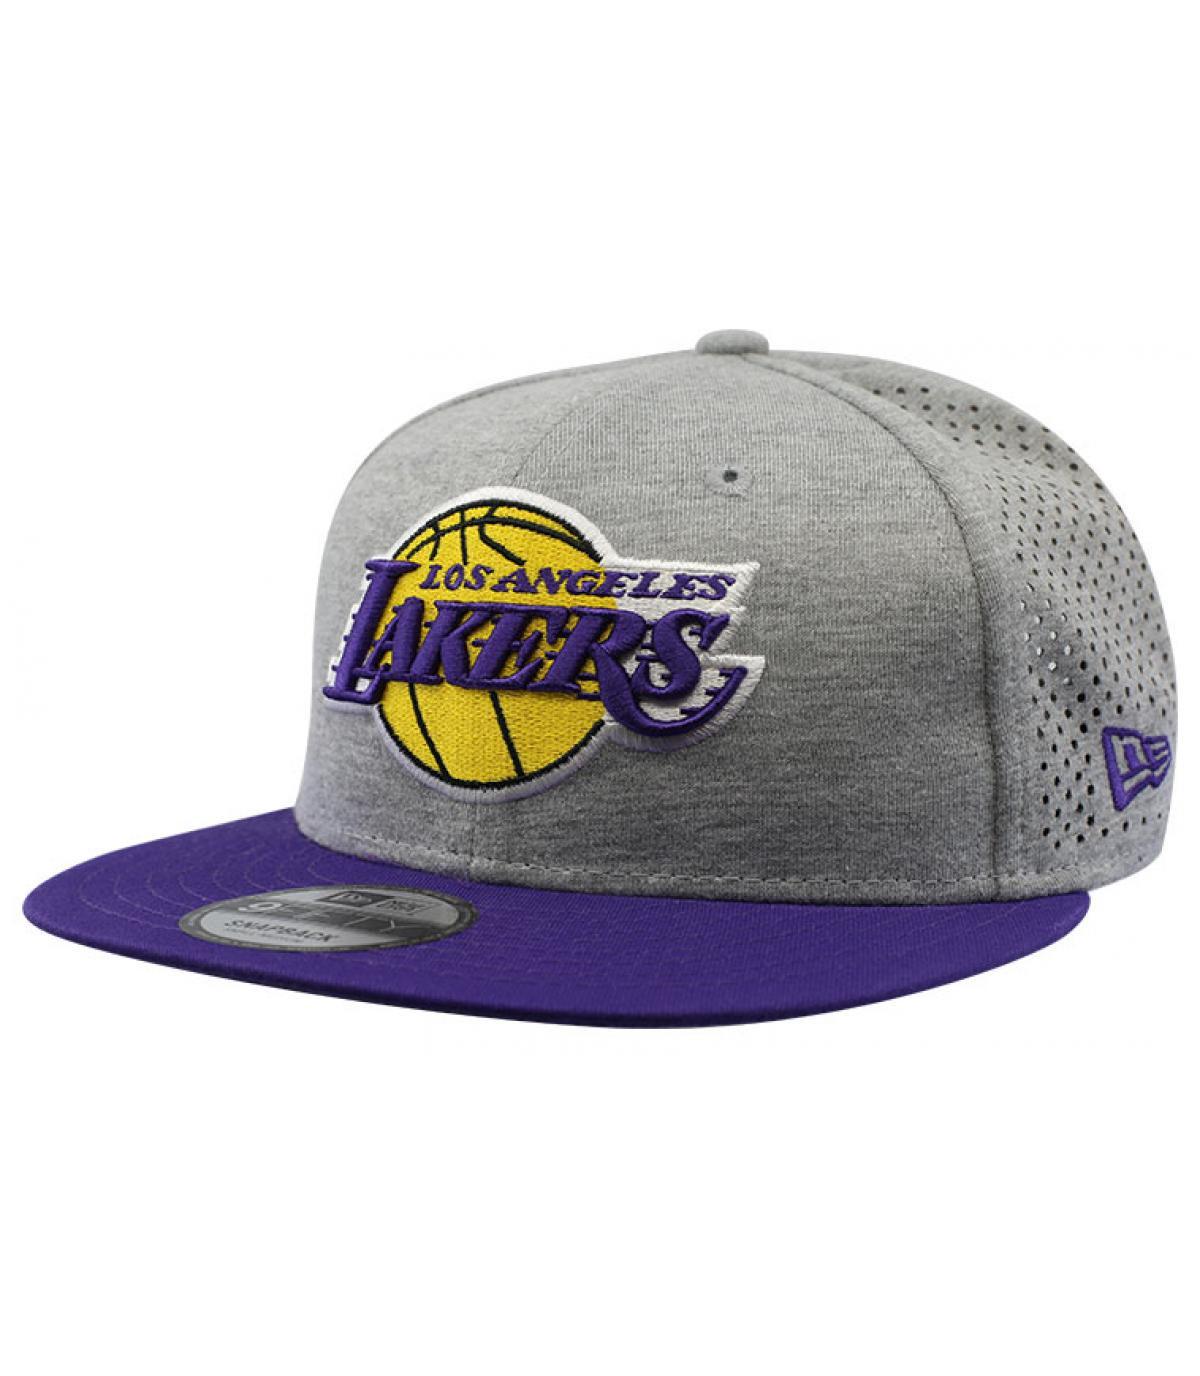 Details Shadow Tech 9Fifty Lakers - Abbildung 2